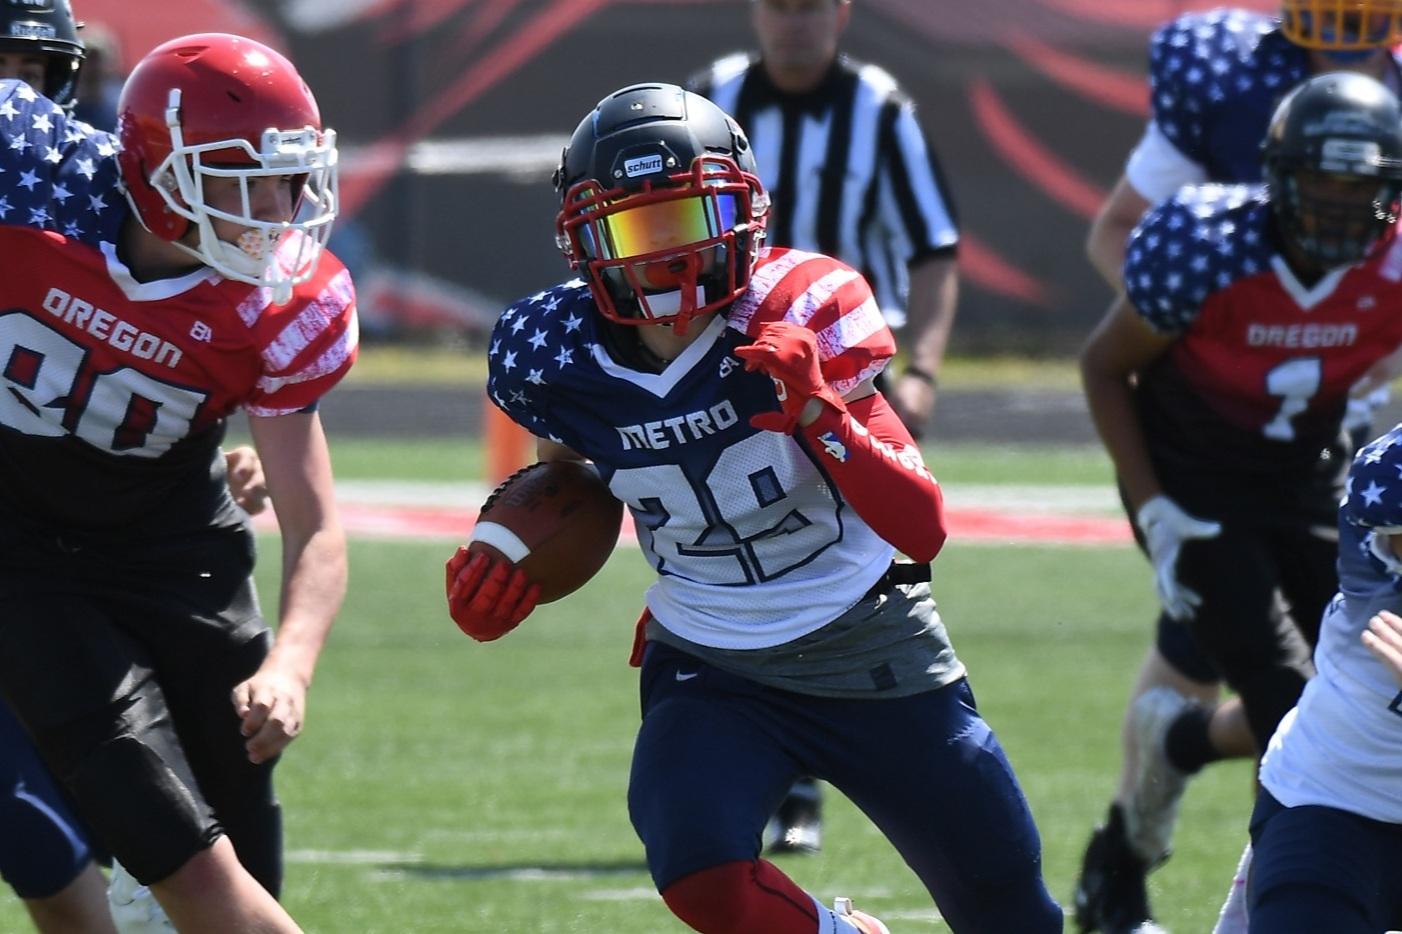 - Foster Athletics PresentsThe Oregon All State GamesJune 29th 2020 Kickoff Times: 6th Grade: 9am7th Grade: Noon8th Grade : 3pmLocation: South Albany High School